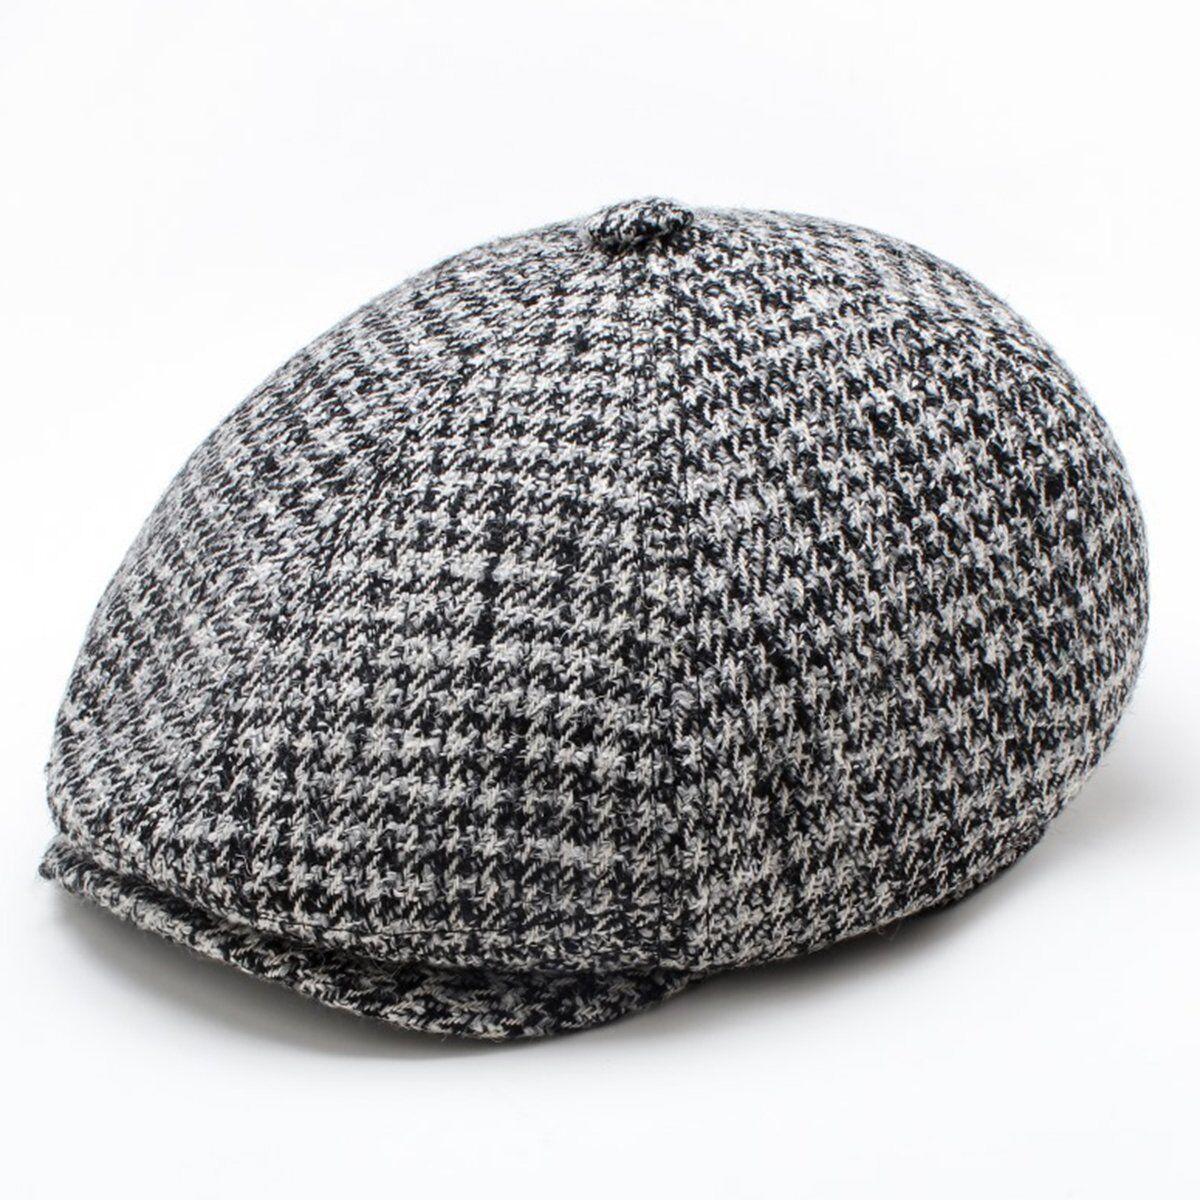 Men Wool Herringbone Tweed Gatsby Newsboy Cap Ivy Hat Golf Driving Flat  Cabbie  8978fa84a7a4